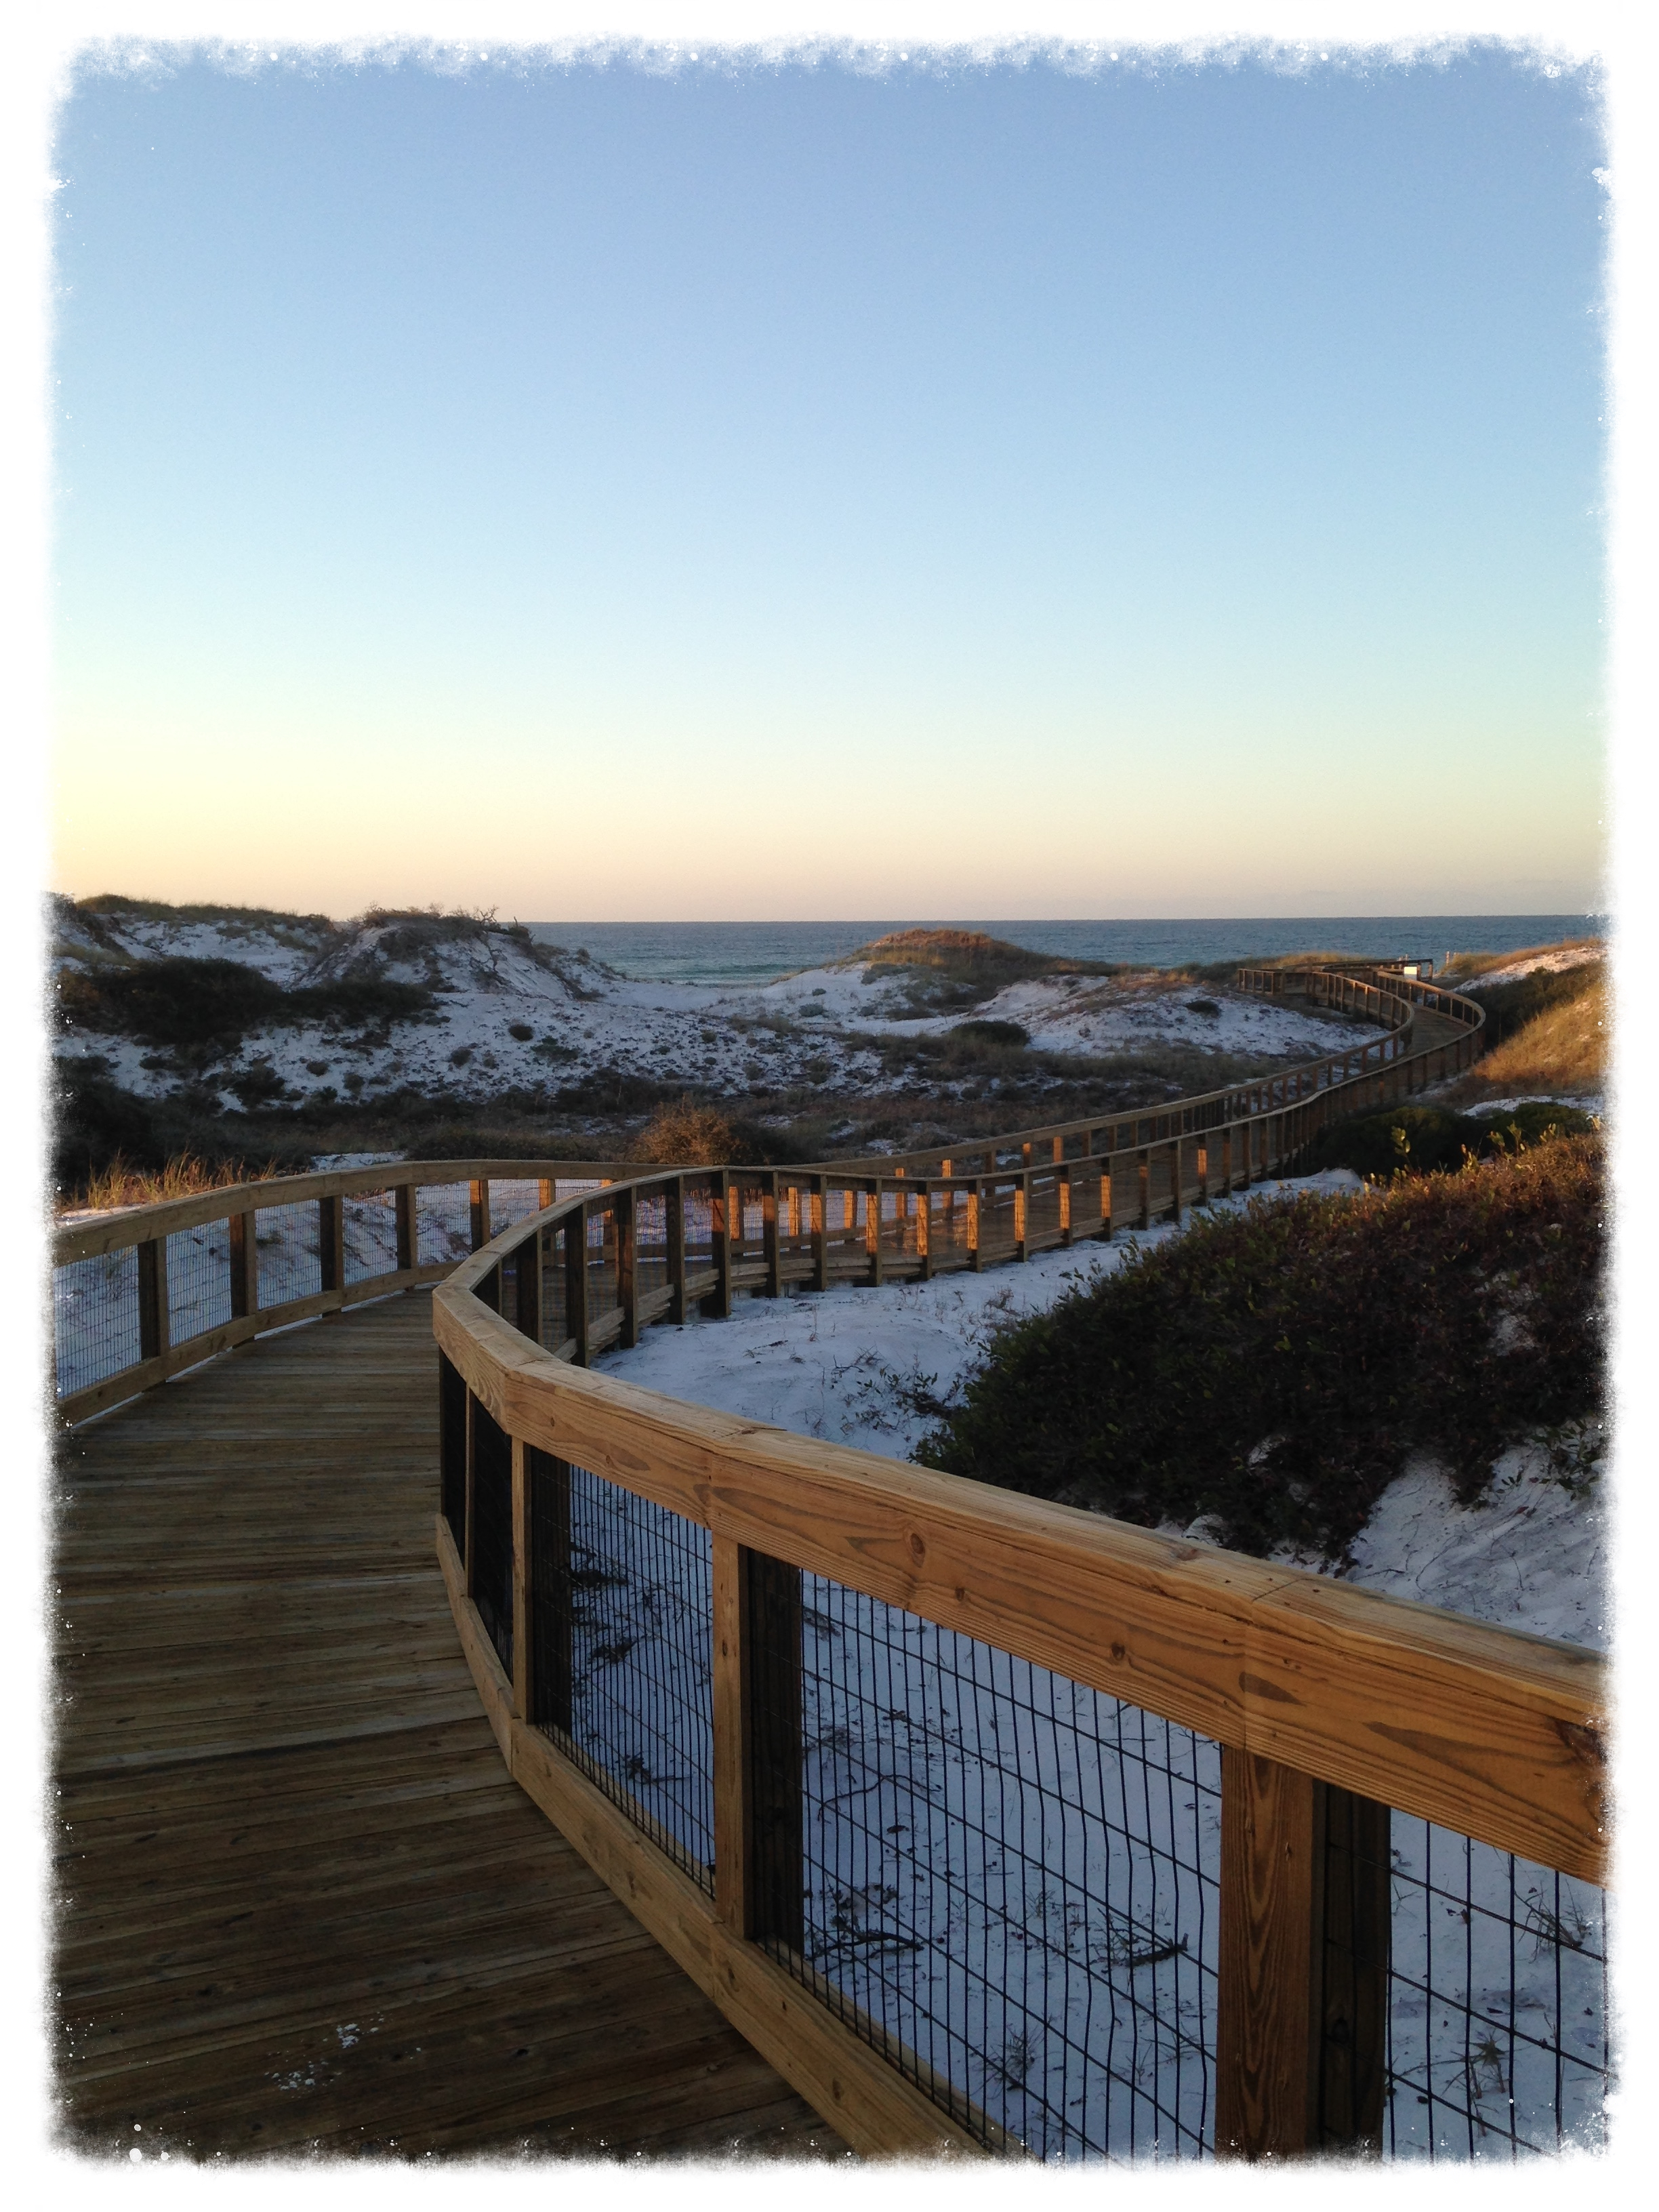 Beach Boardwalk with Handrail